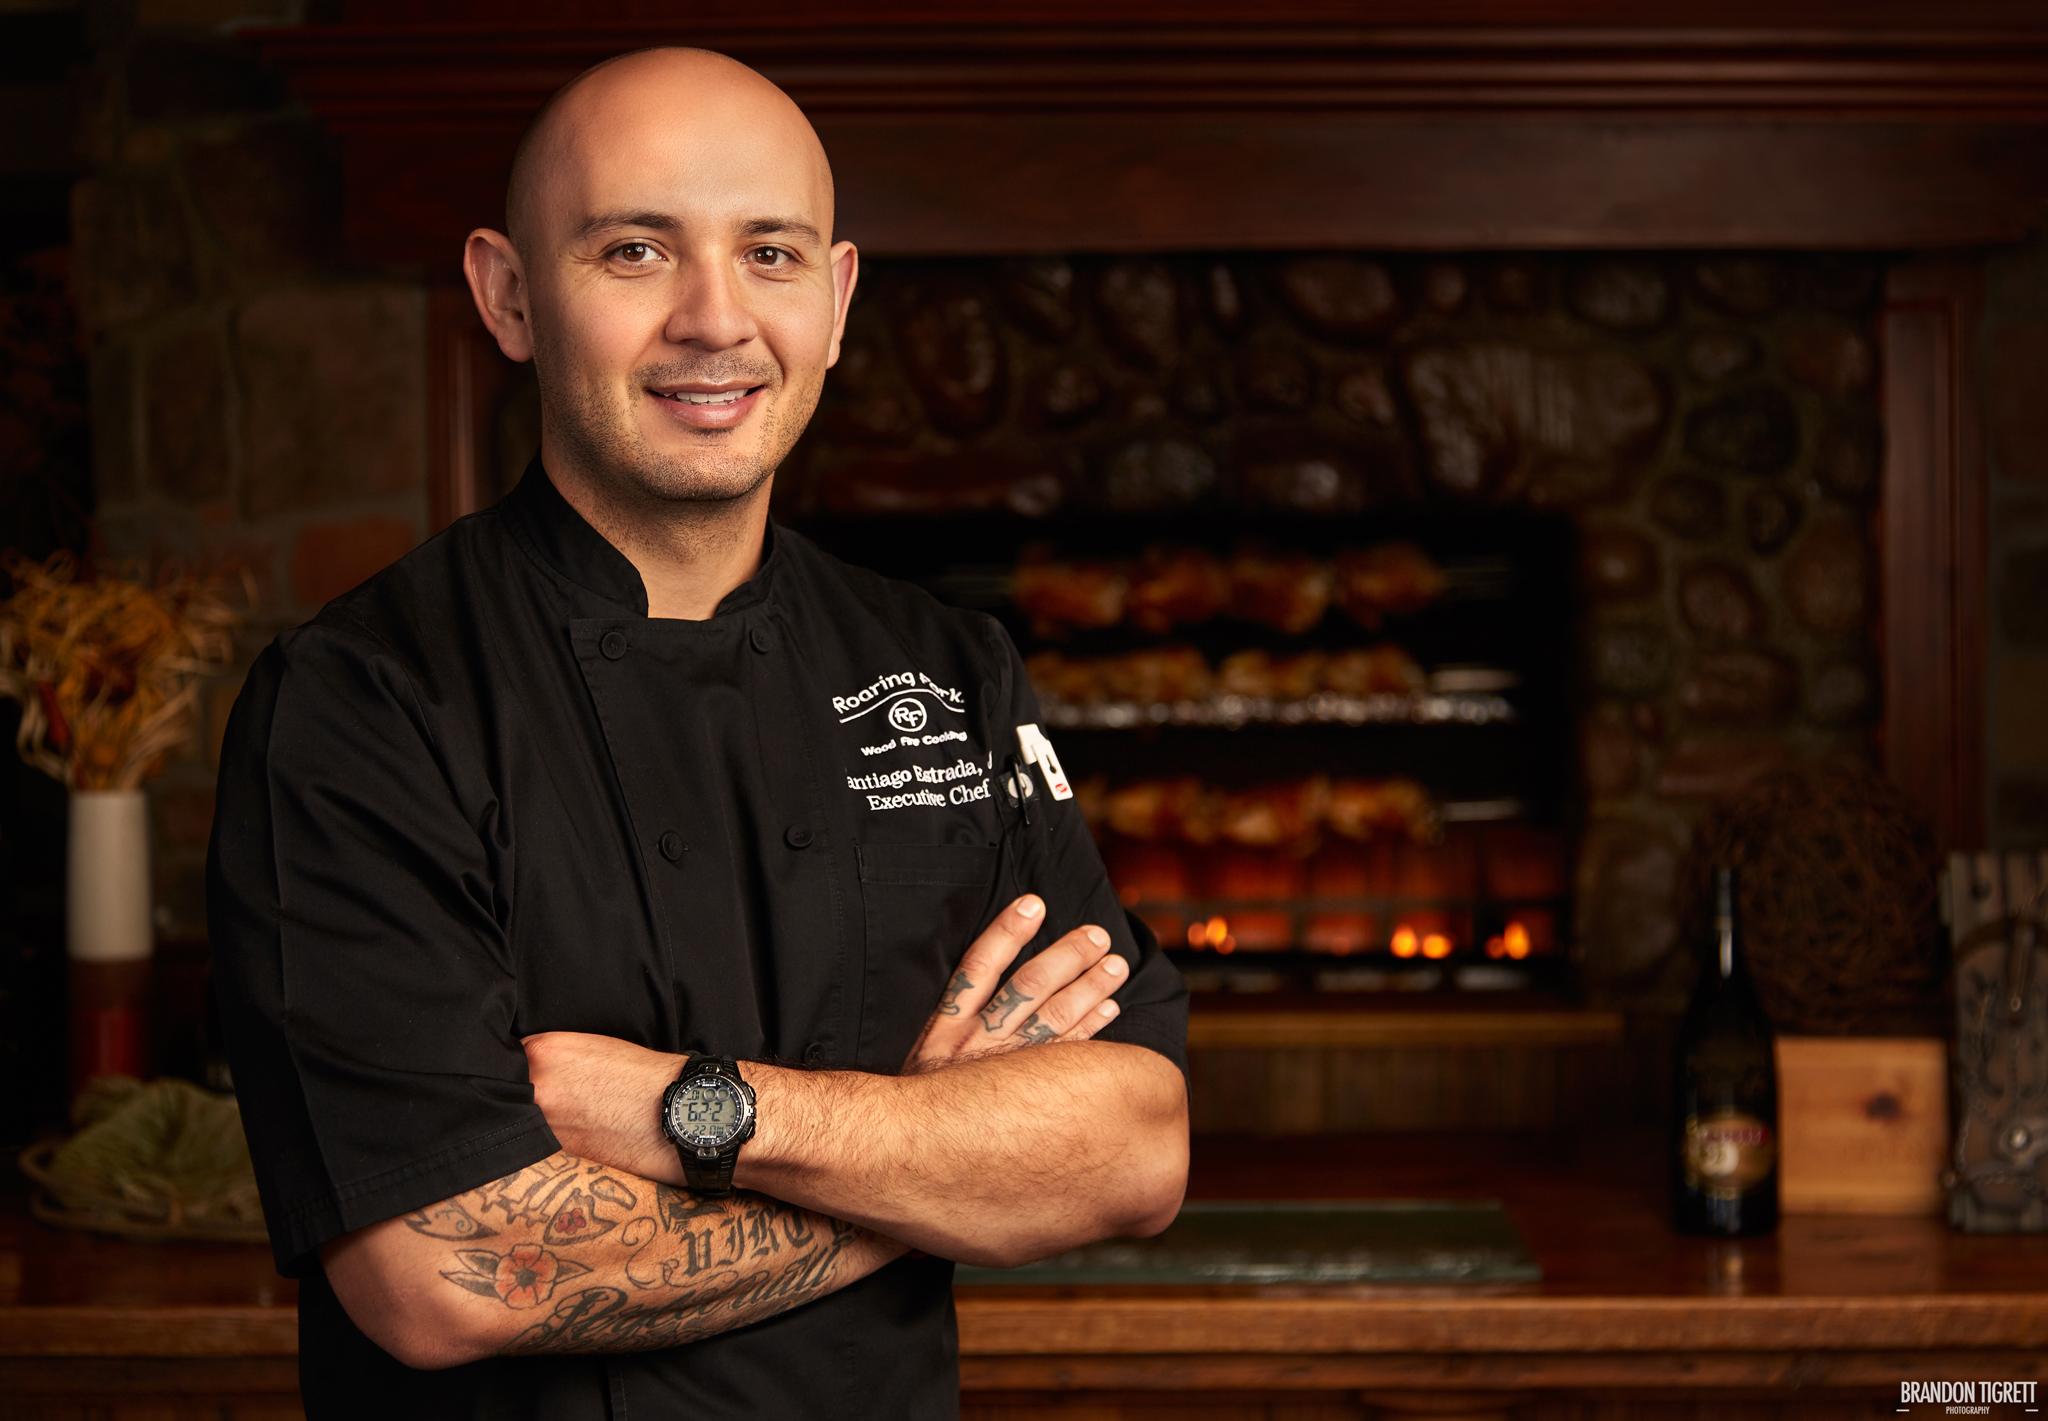 Executive Chef Portrait - The Roaring Fork, Scottsdale Santiago Estrada